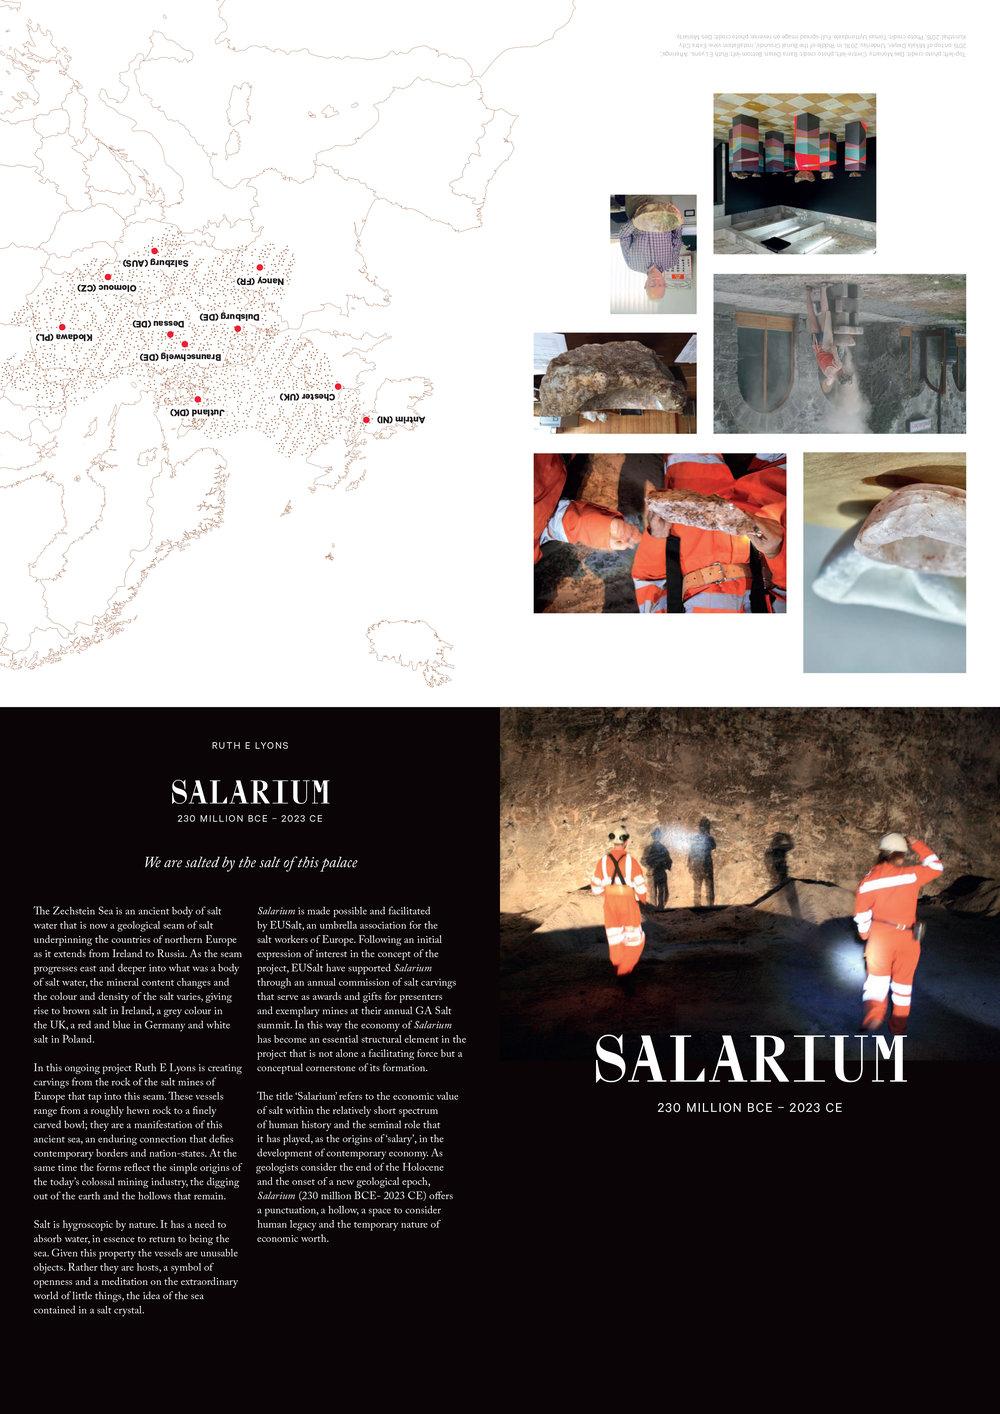 Salarium leaflet page-1RuthELyons.jpg